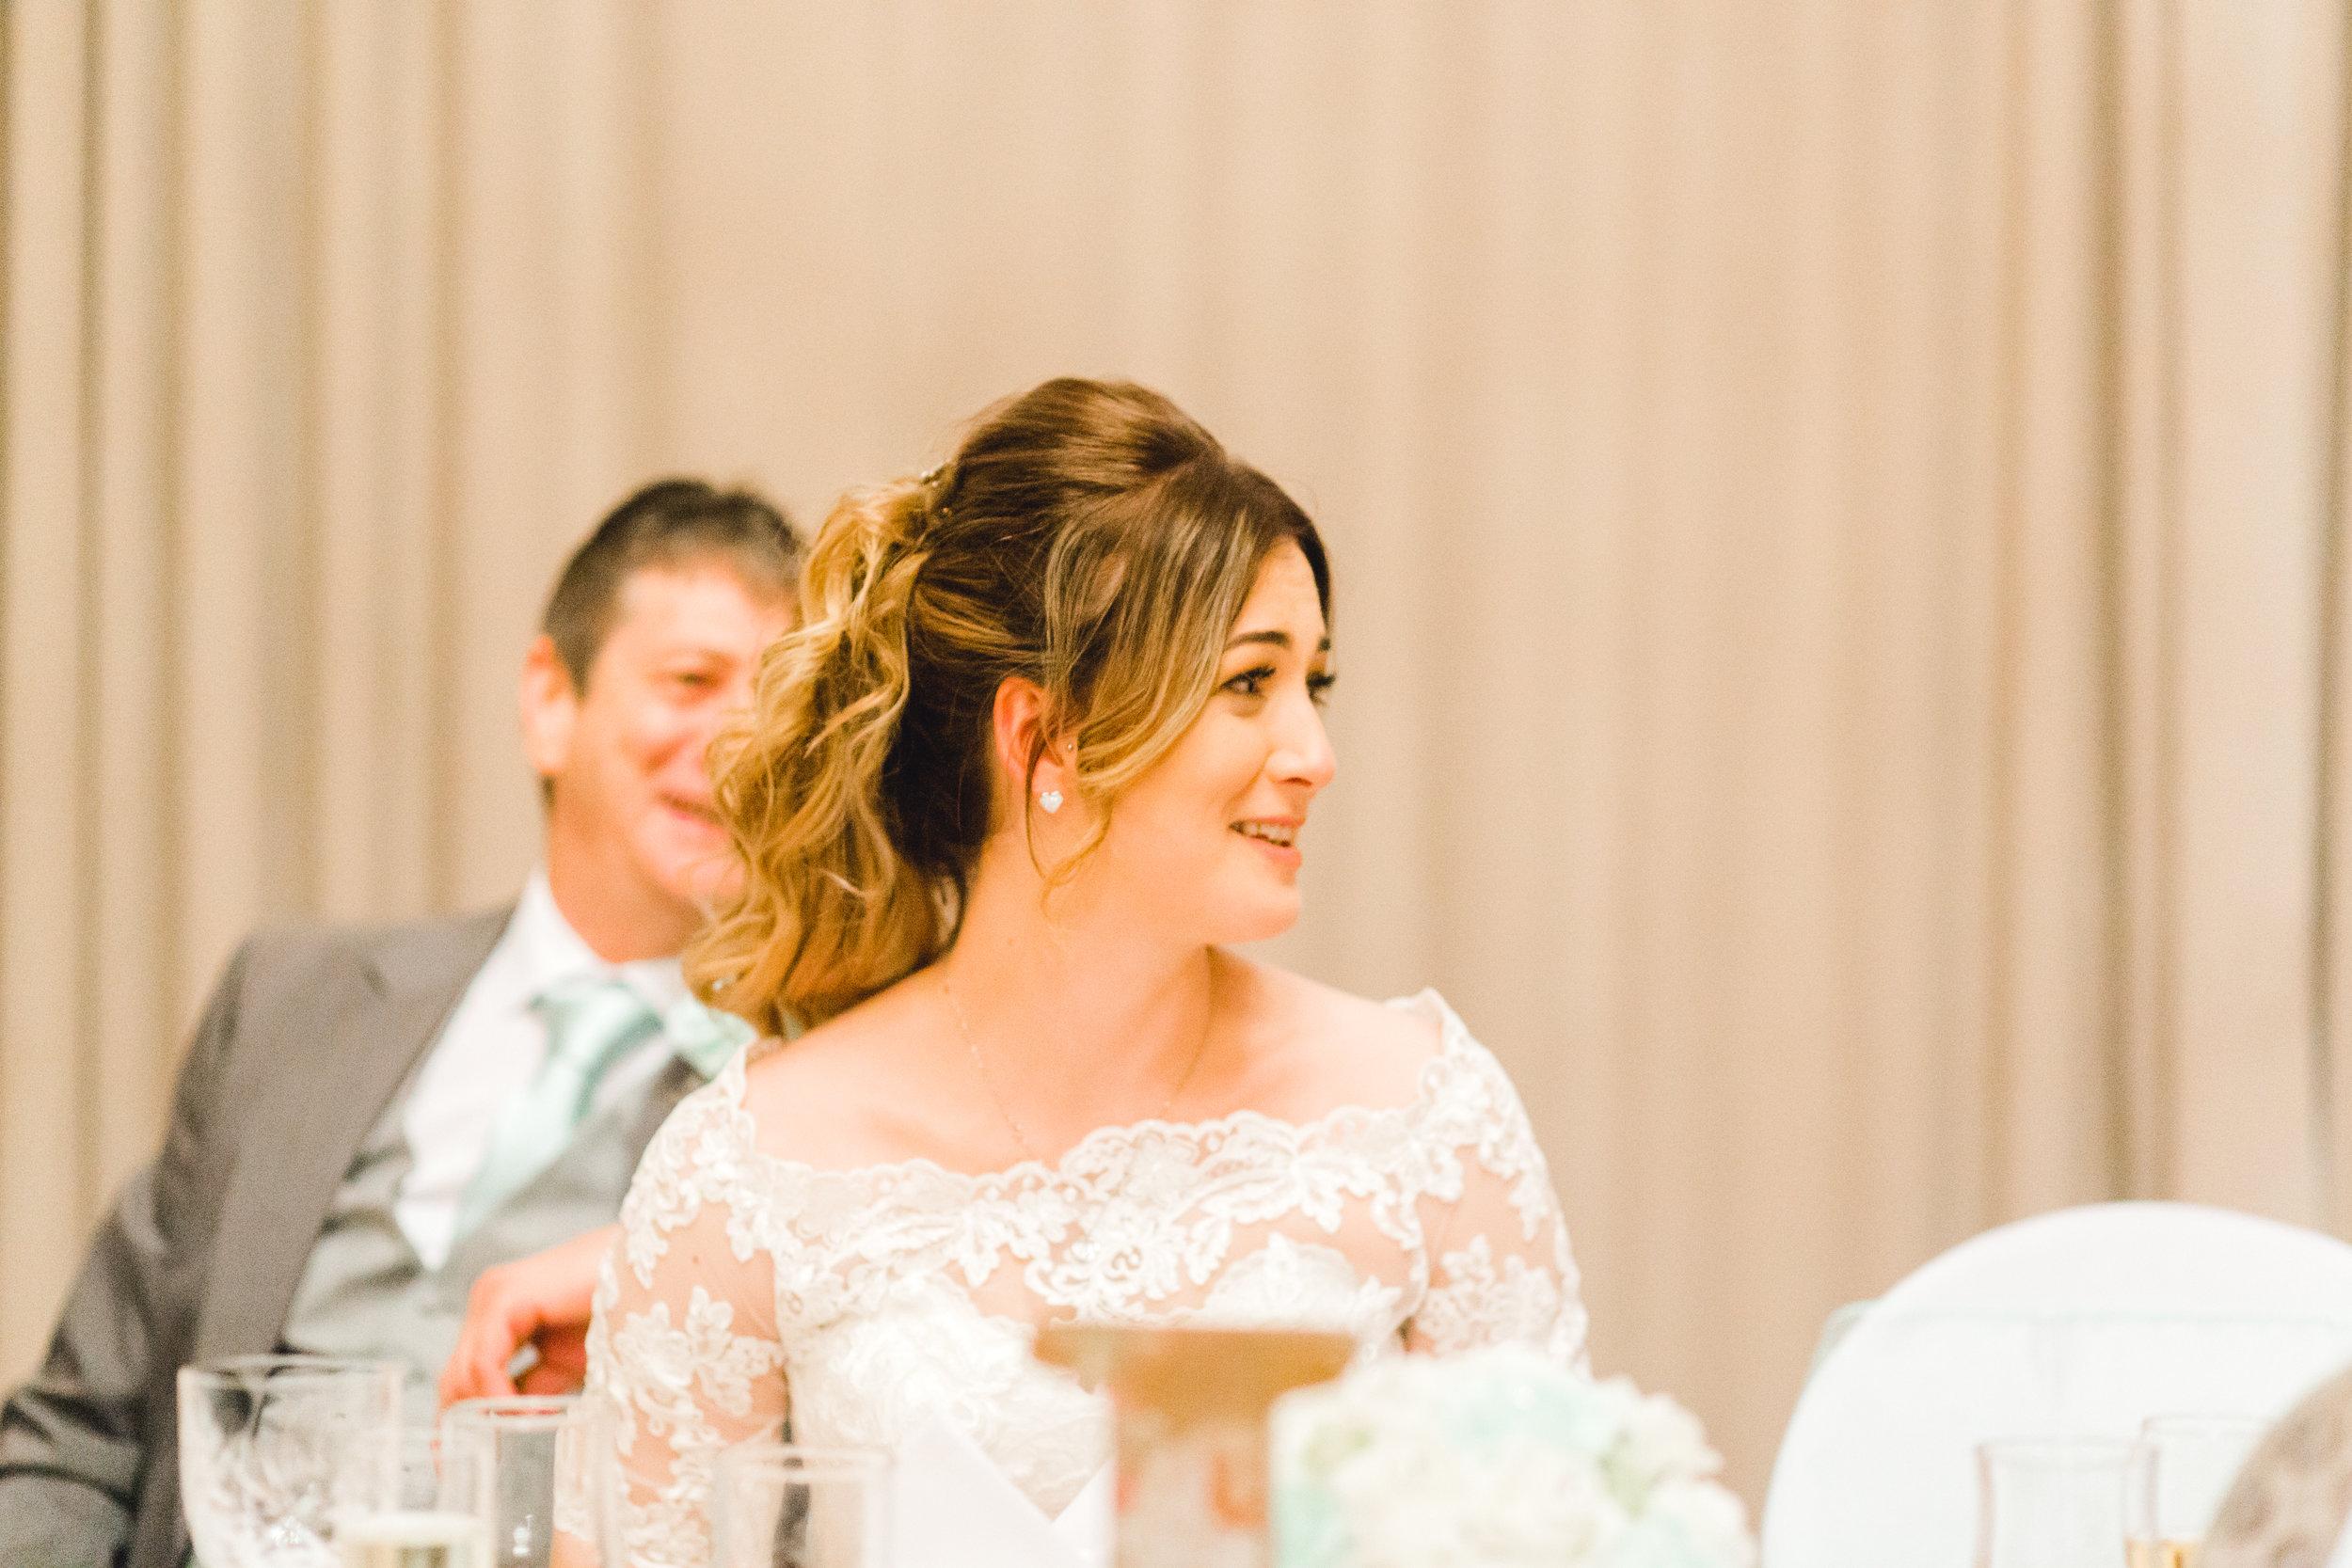 Brides reaction during wedding speeches